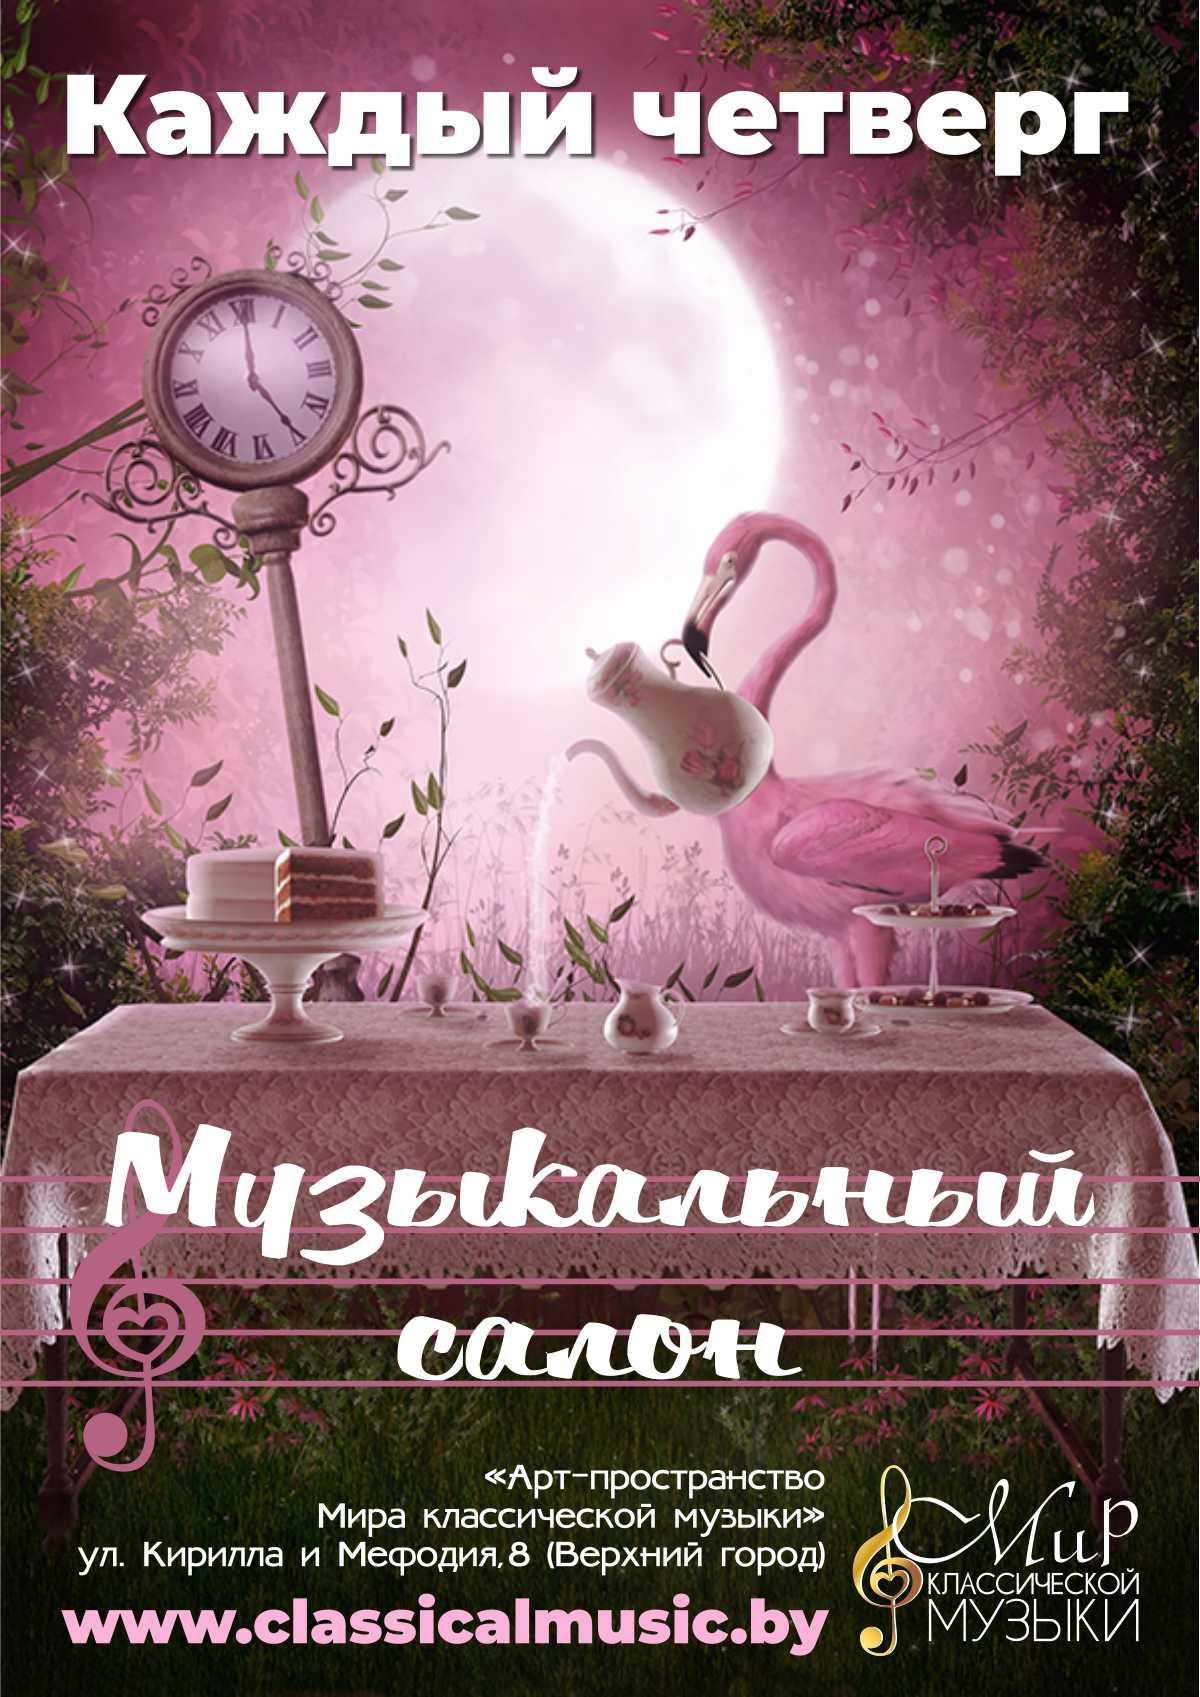 16.01. Классический музыкальный салон